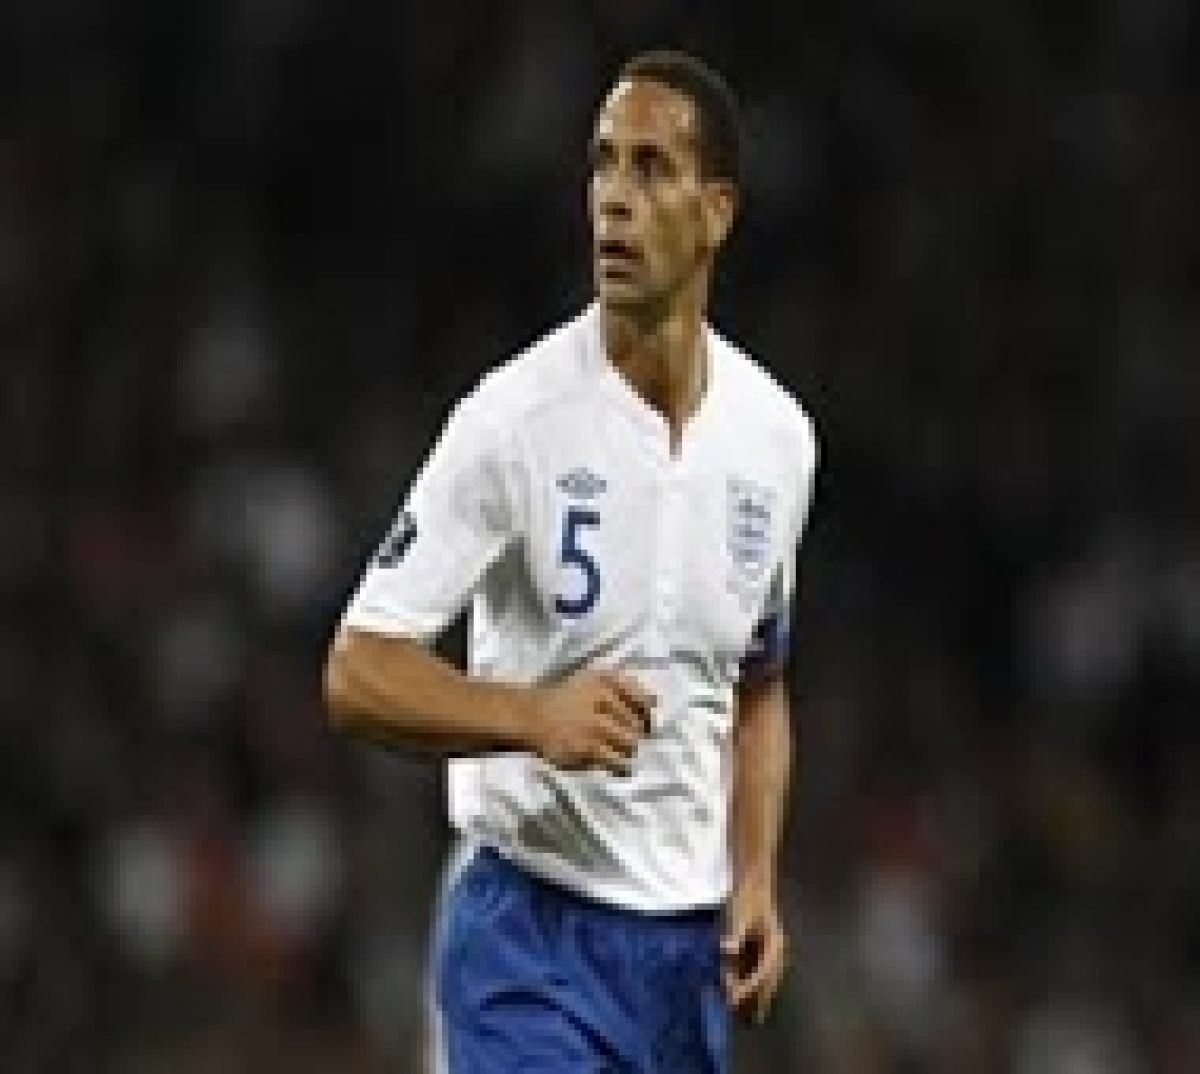 Ferdinand says FA Cup glory can save Van Gaals job at Man Utd